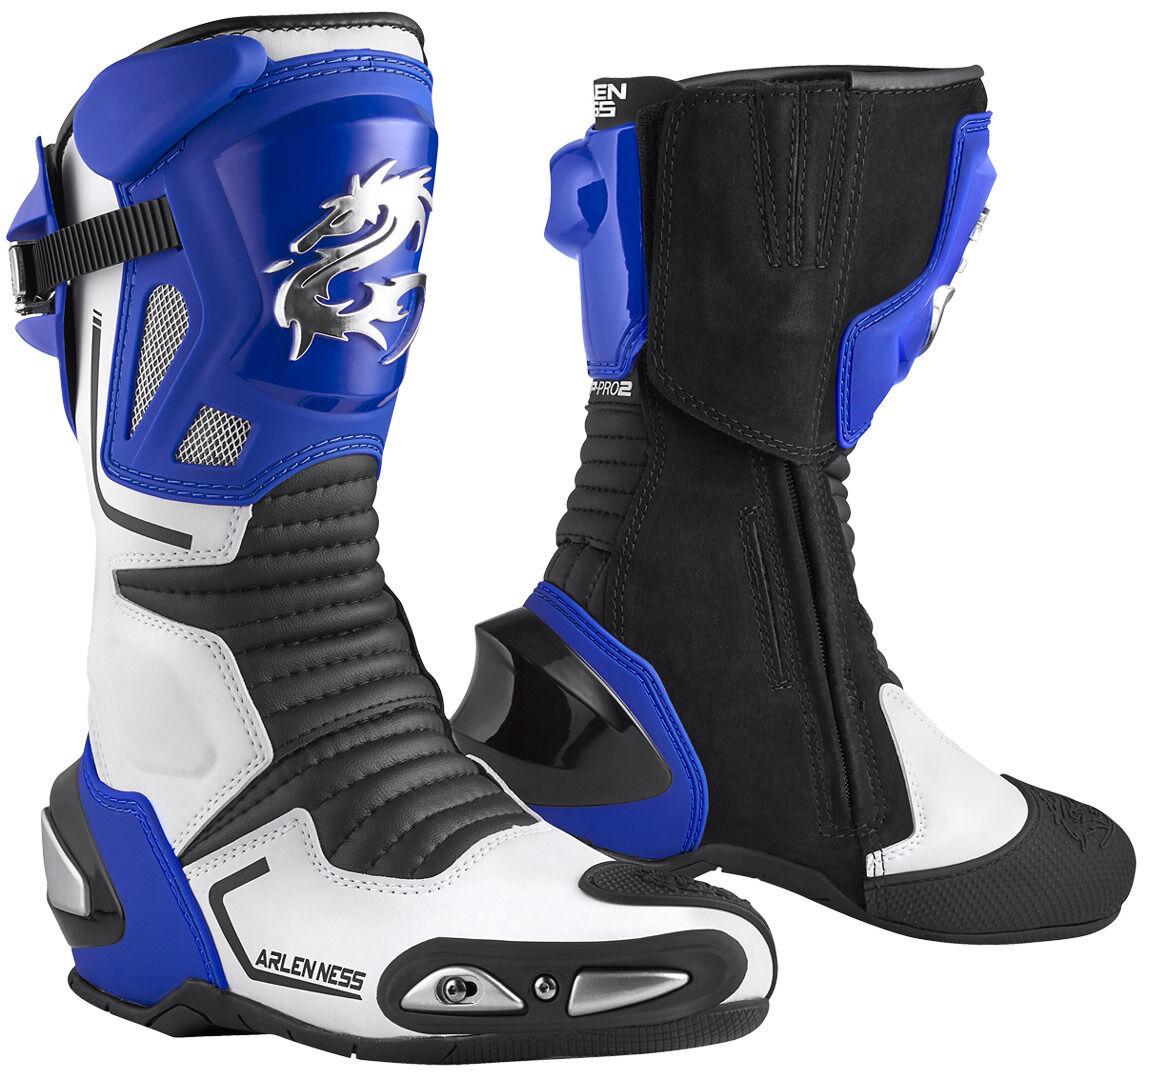 Arlen Ness Sugello Bottes de moto Noir Blanc Bleu taille : 37